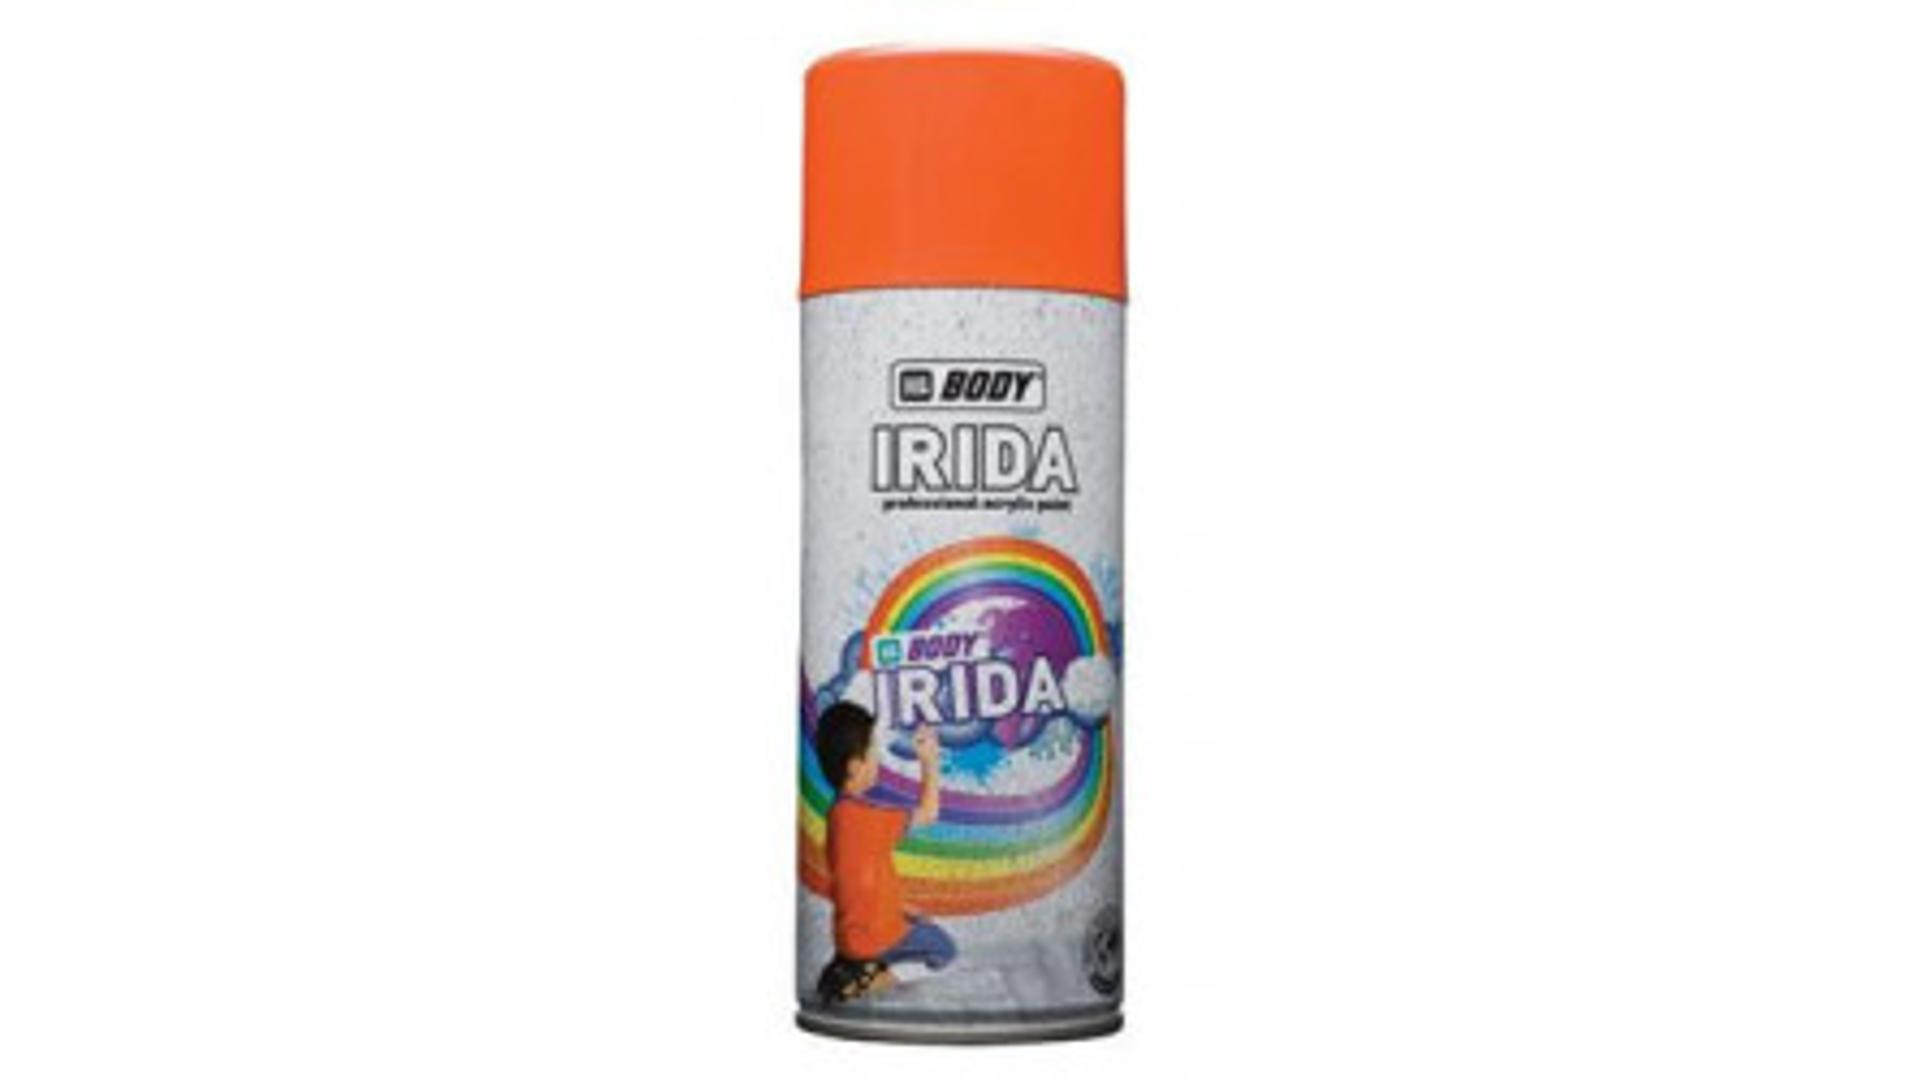 HB BODY IRIDA RAL 9005 ČERNÁ matná barva ve spreji 400ML